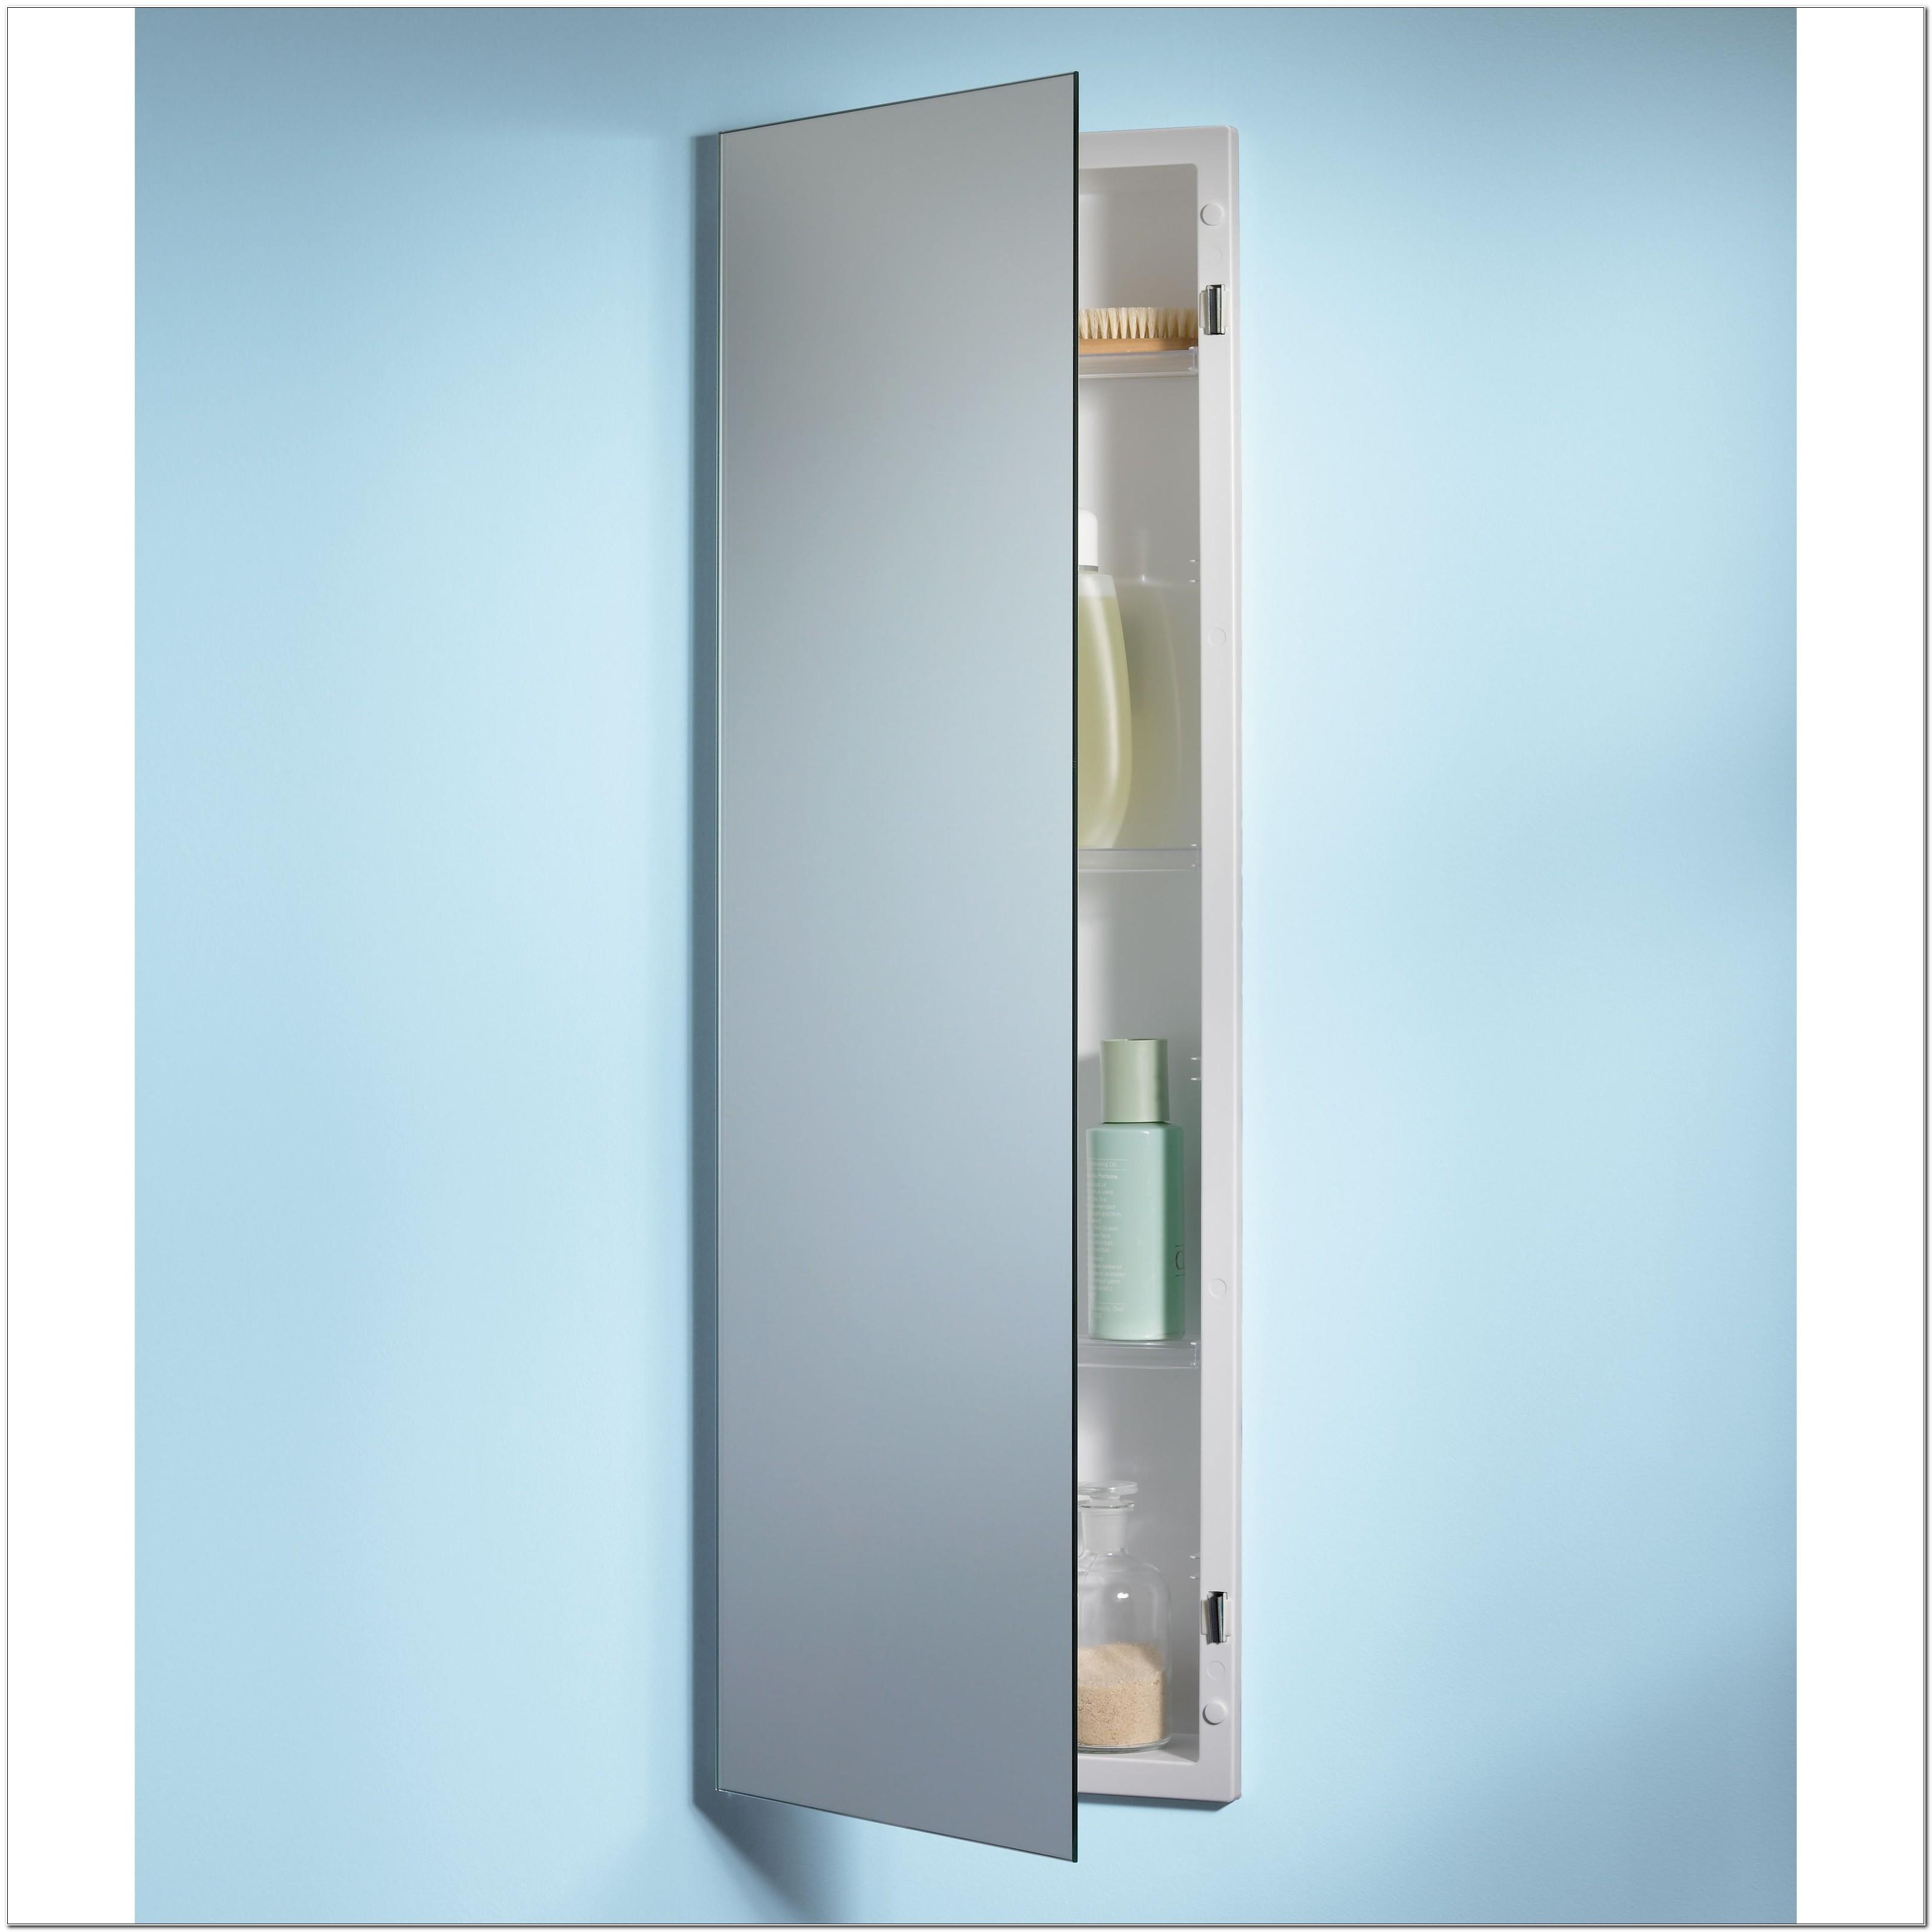 Jensen Medicine Cabinet Replacement Glass Shelves Cabinet Home Design Ideas Aoyrvvy9ya